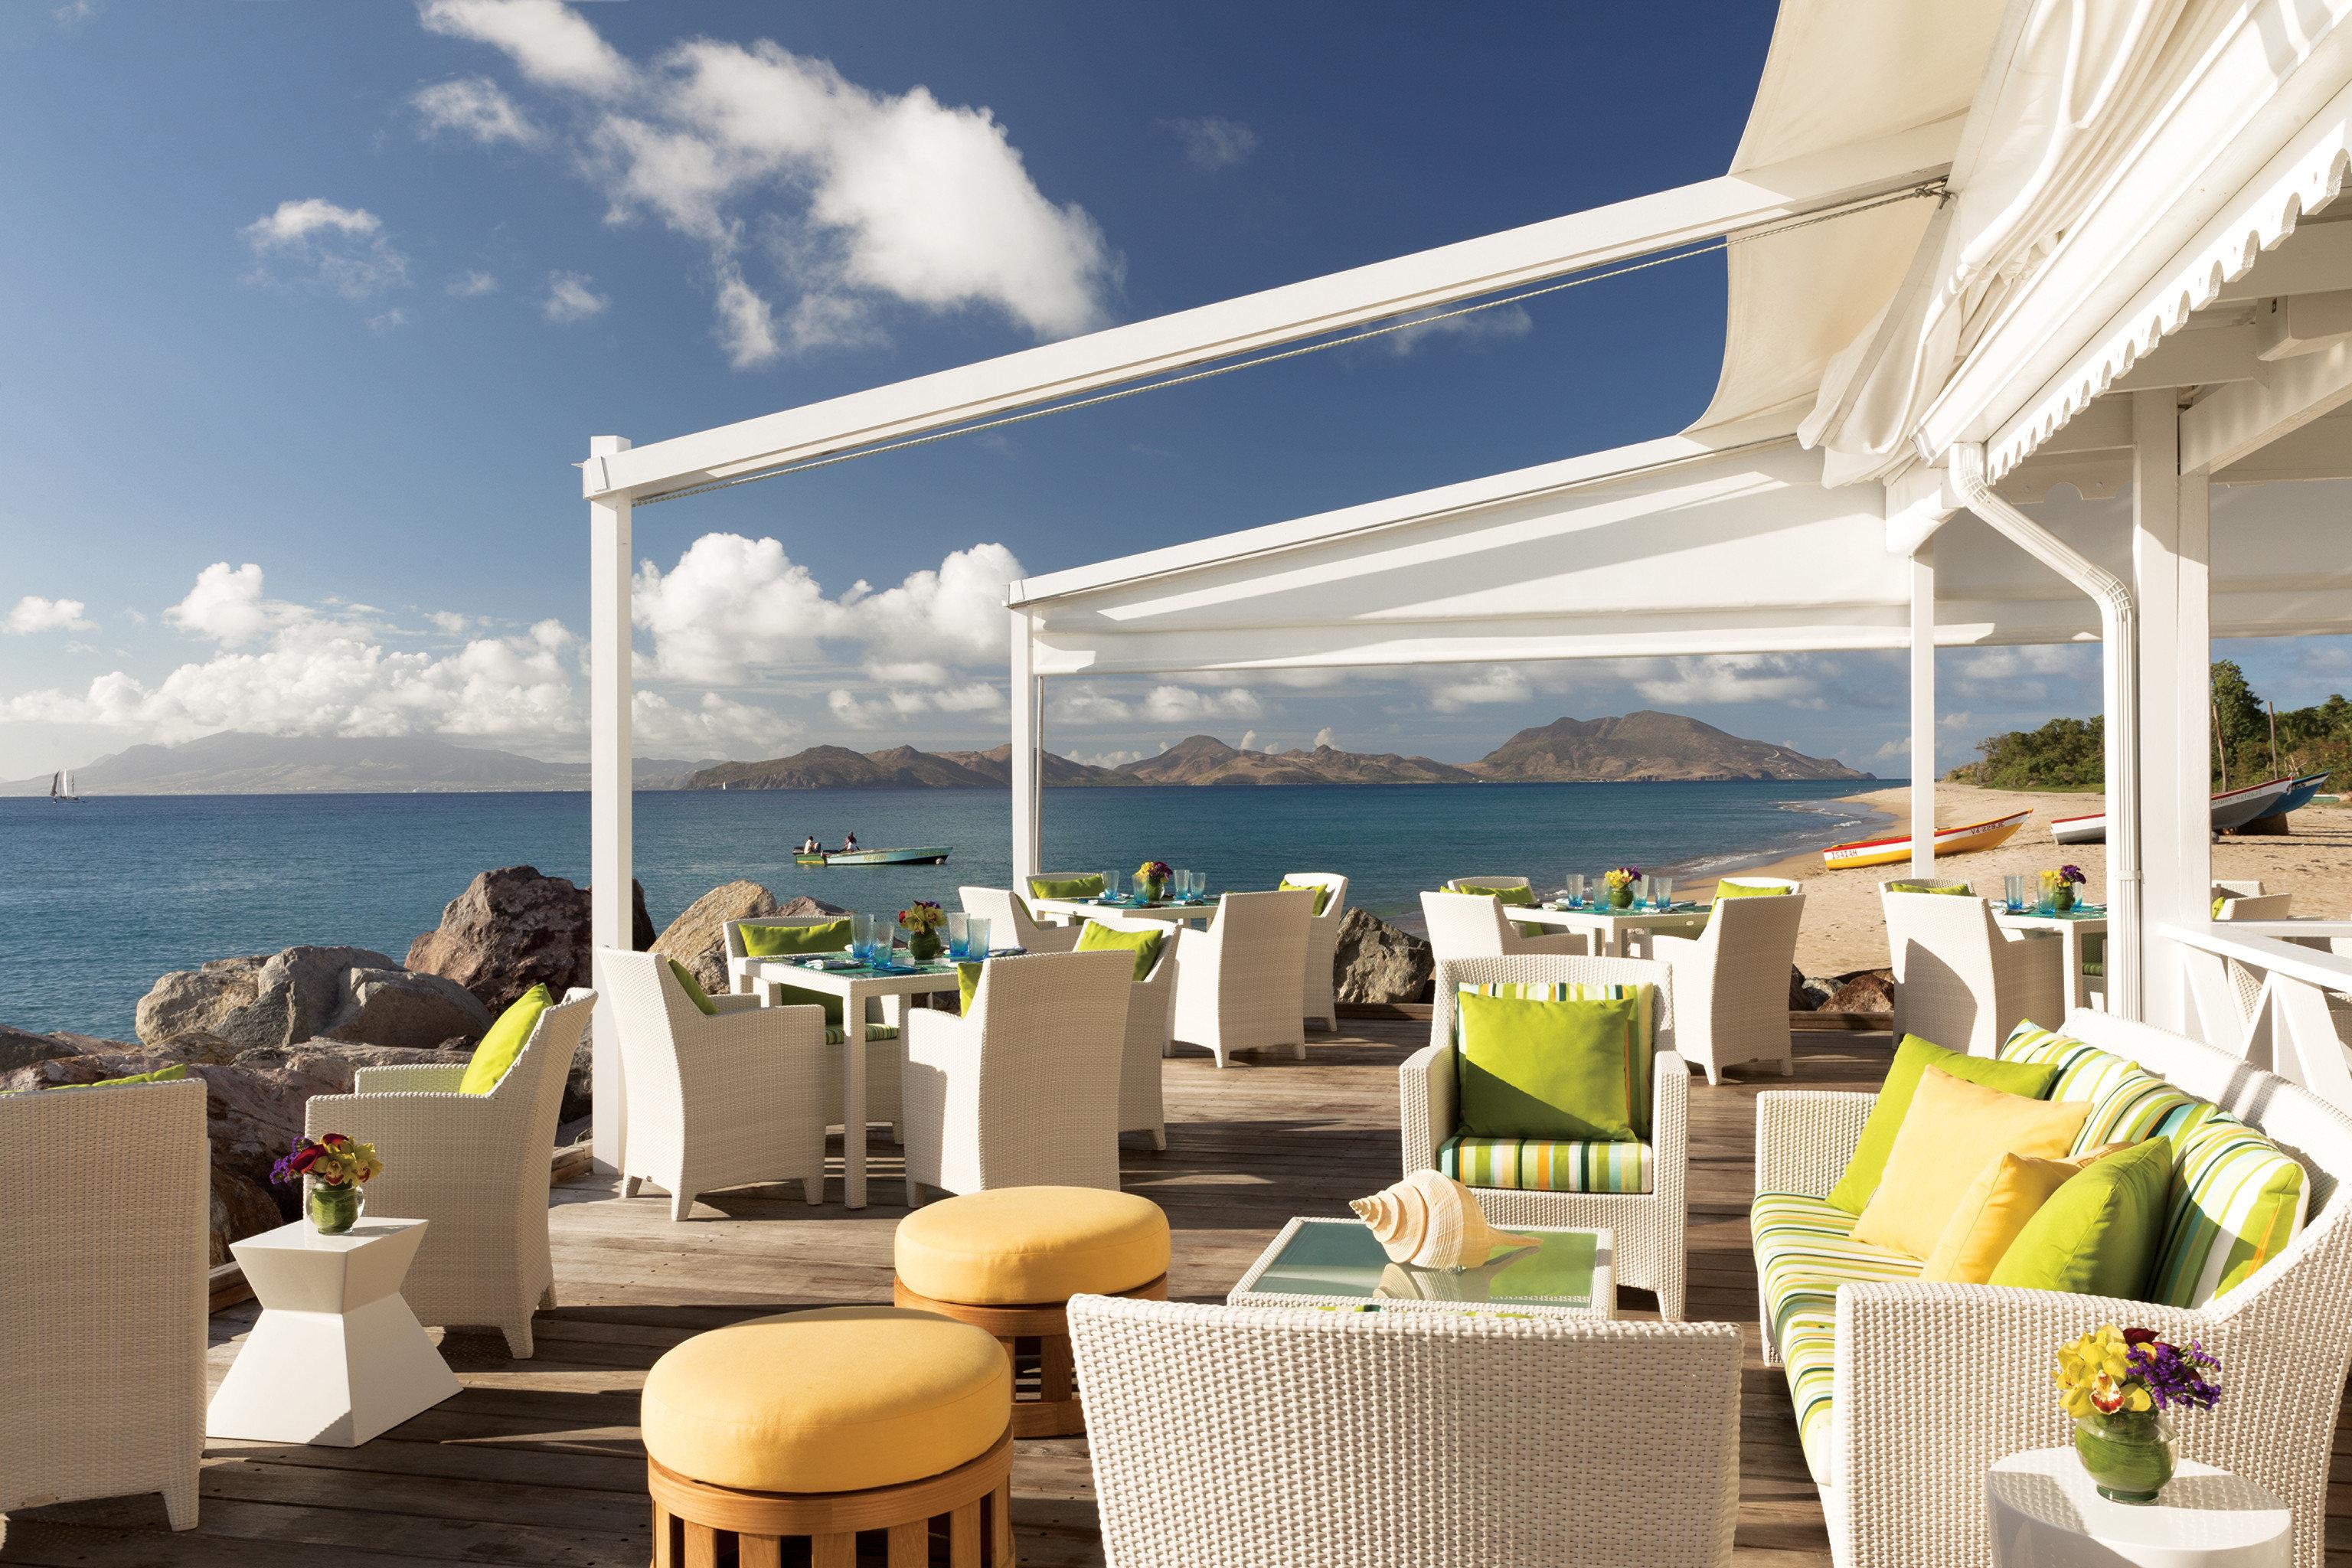 Hip Lounge Luxury Scenic views Trip Ideas sky restaurant Resort caribbean day